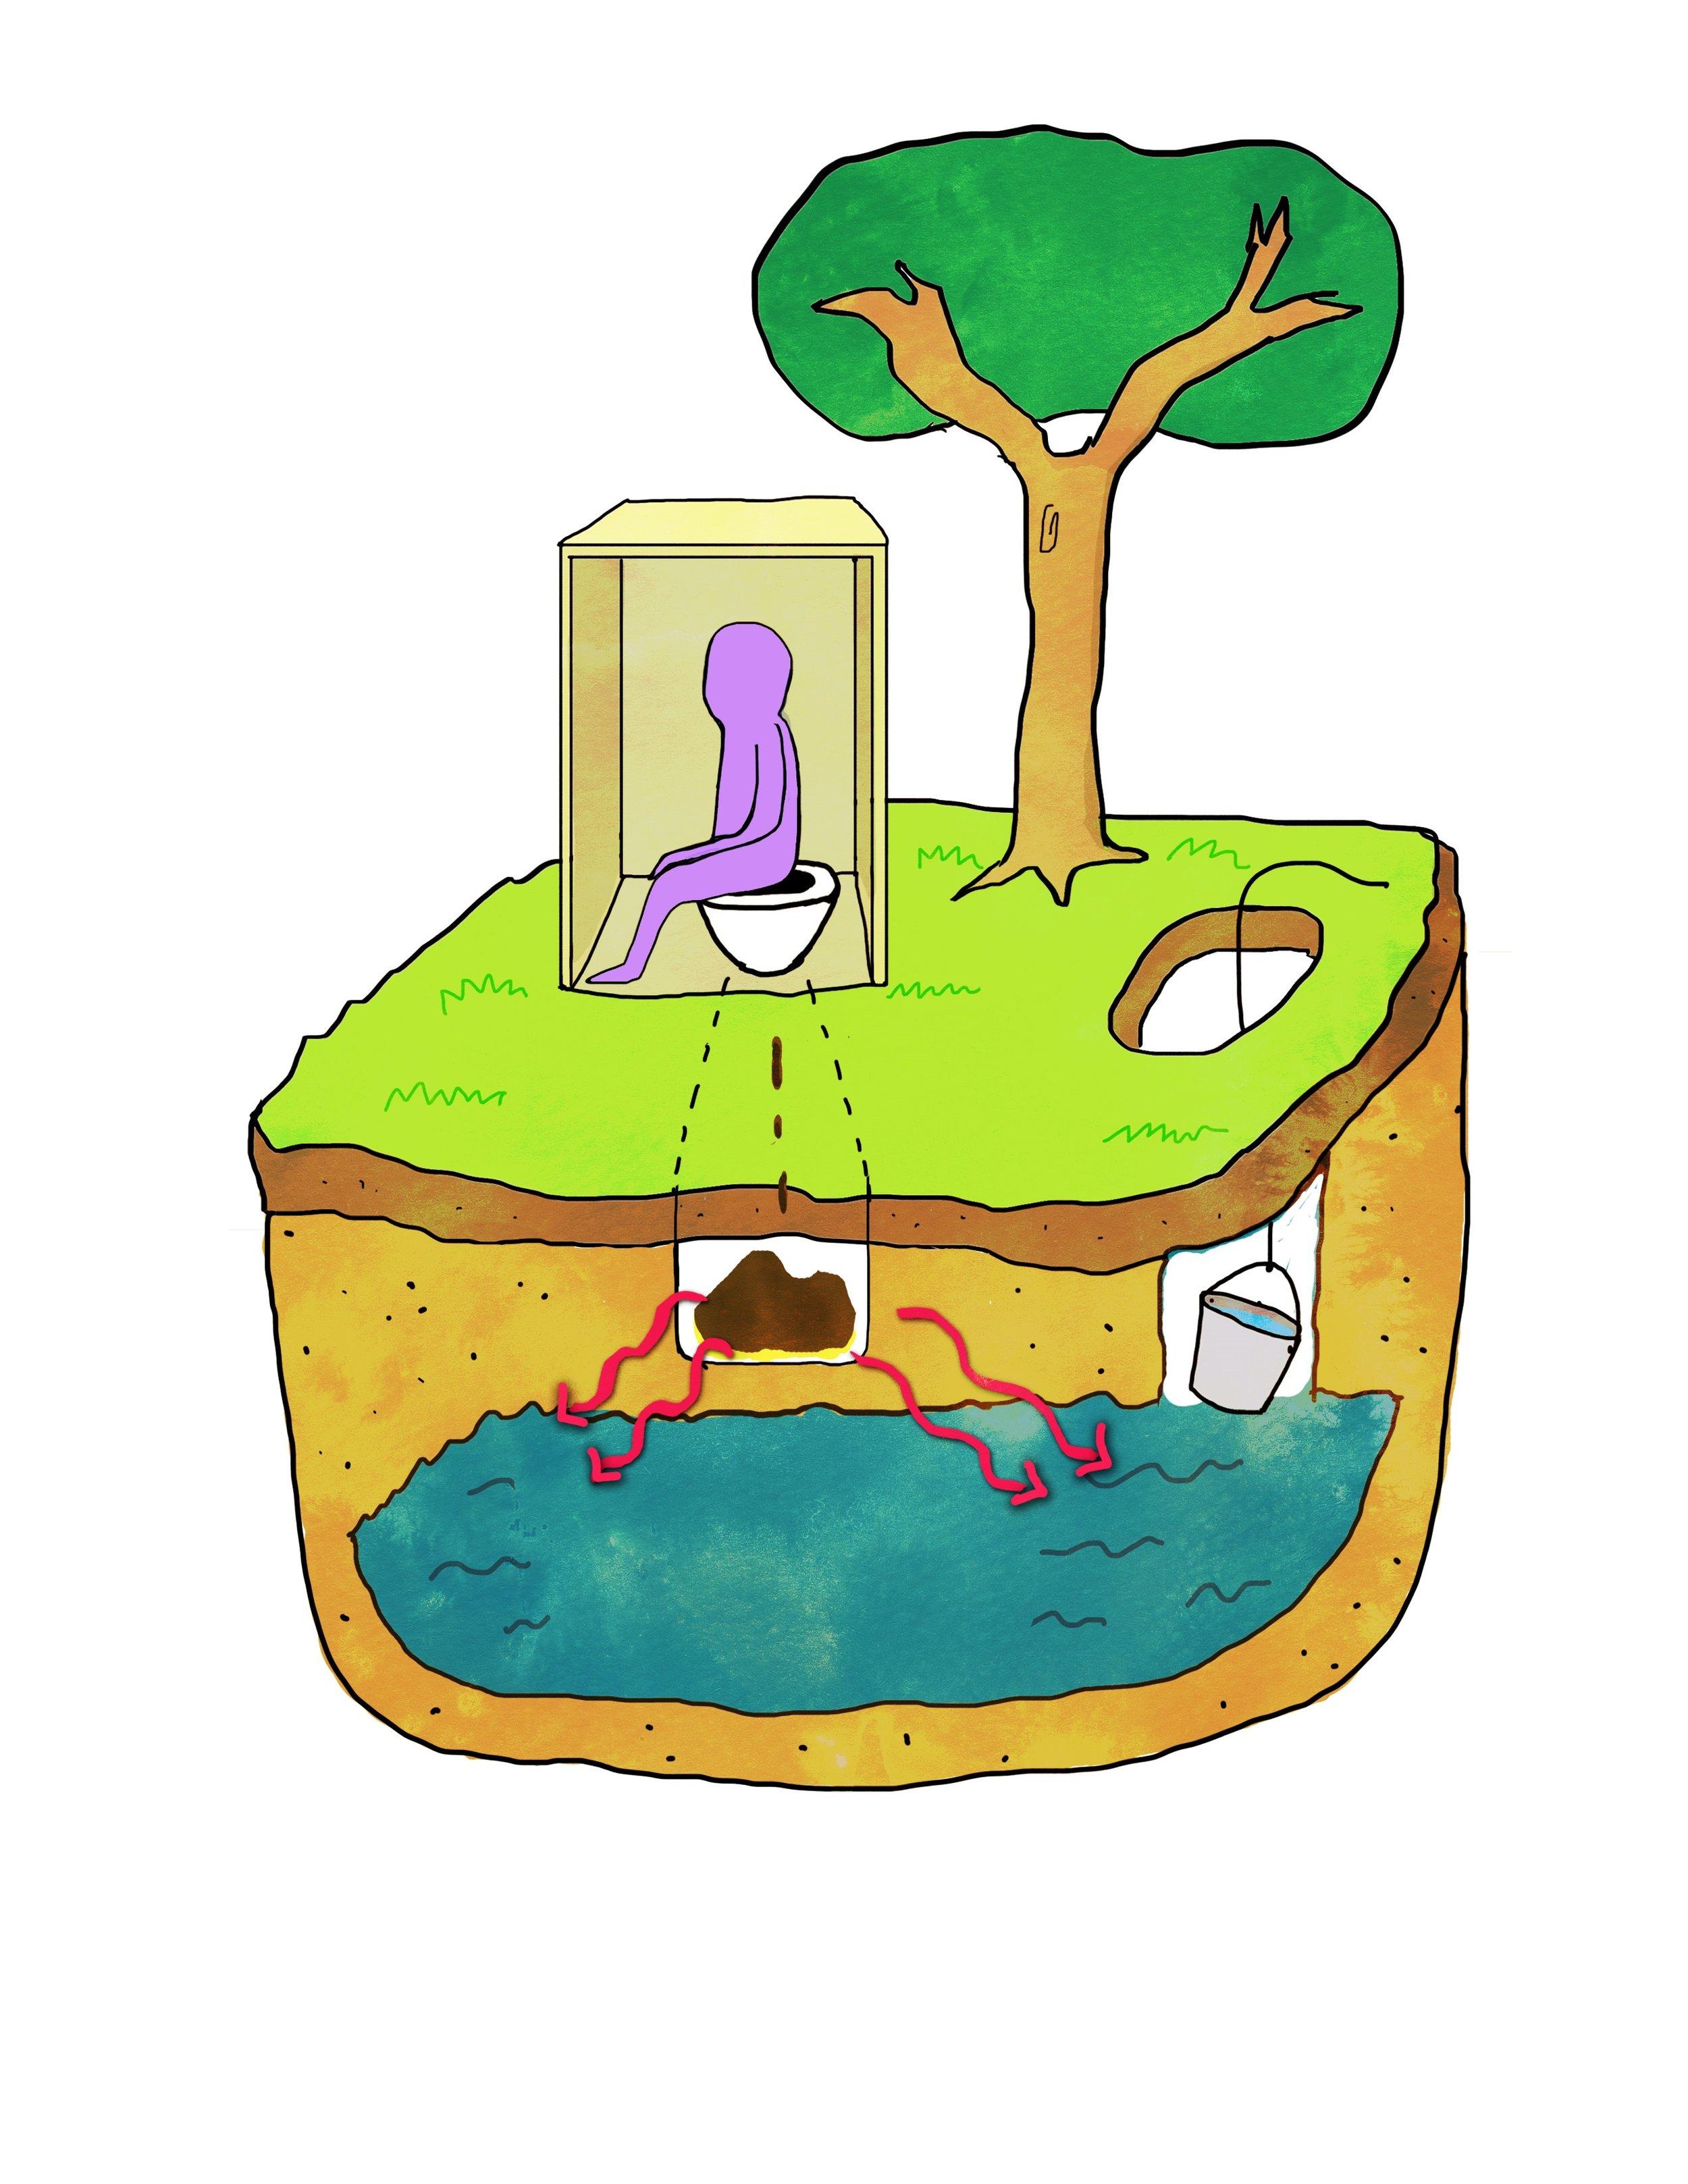 Feces contaminating gound water